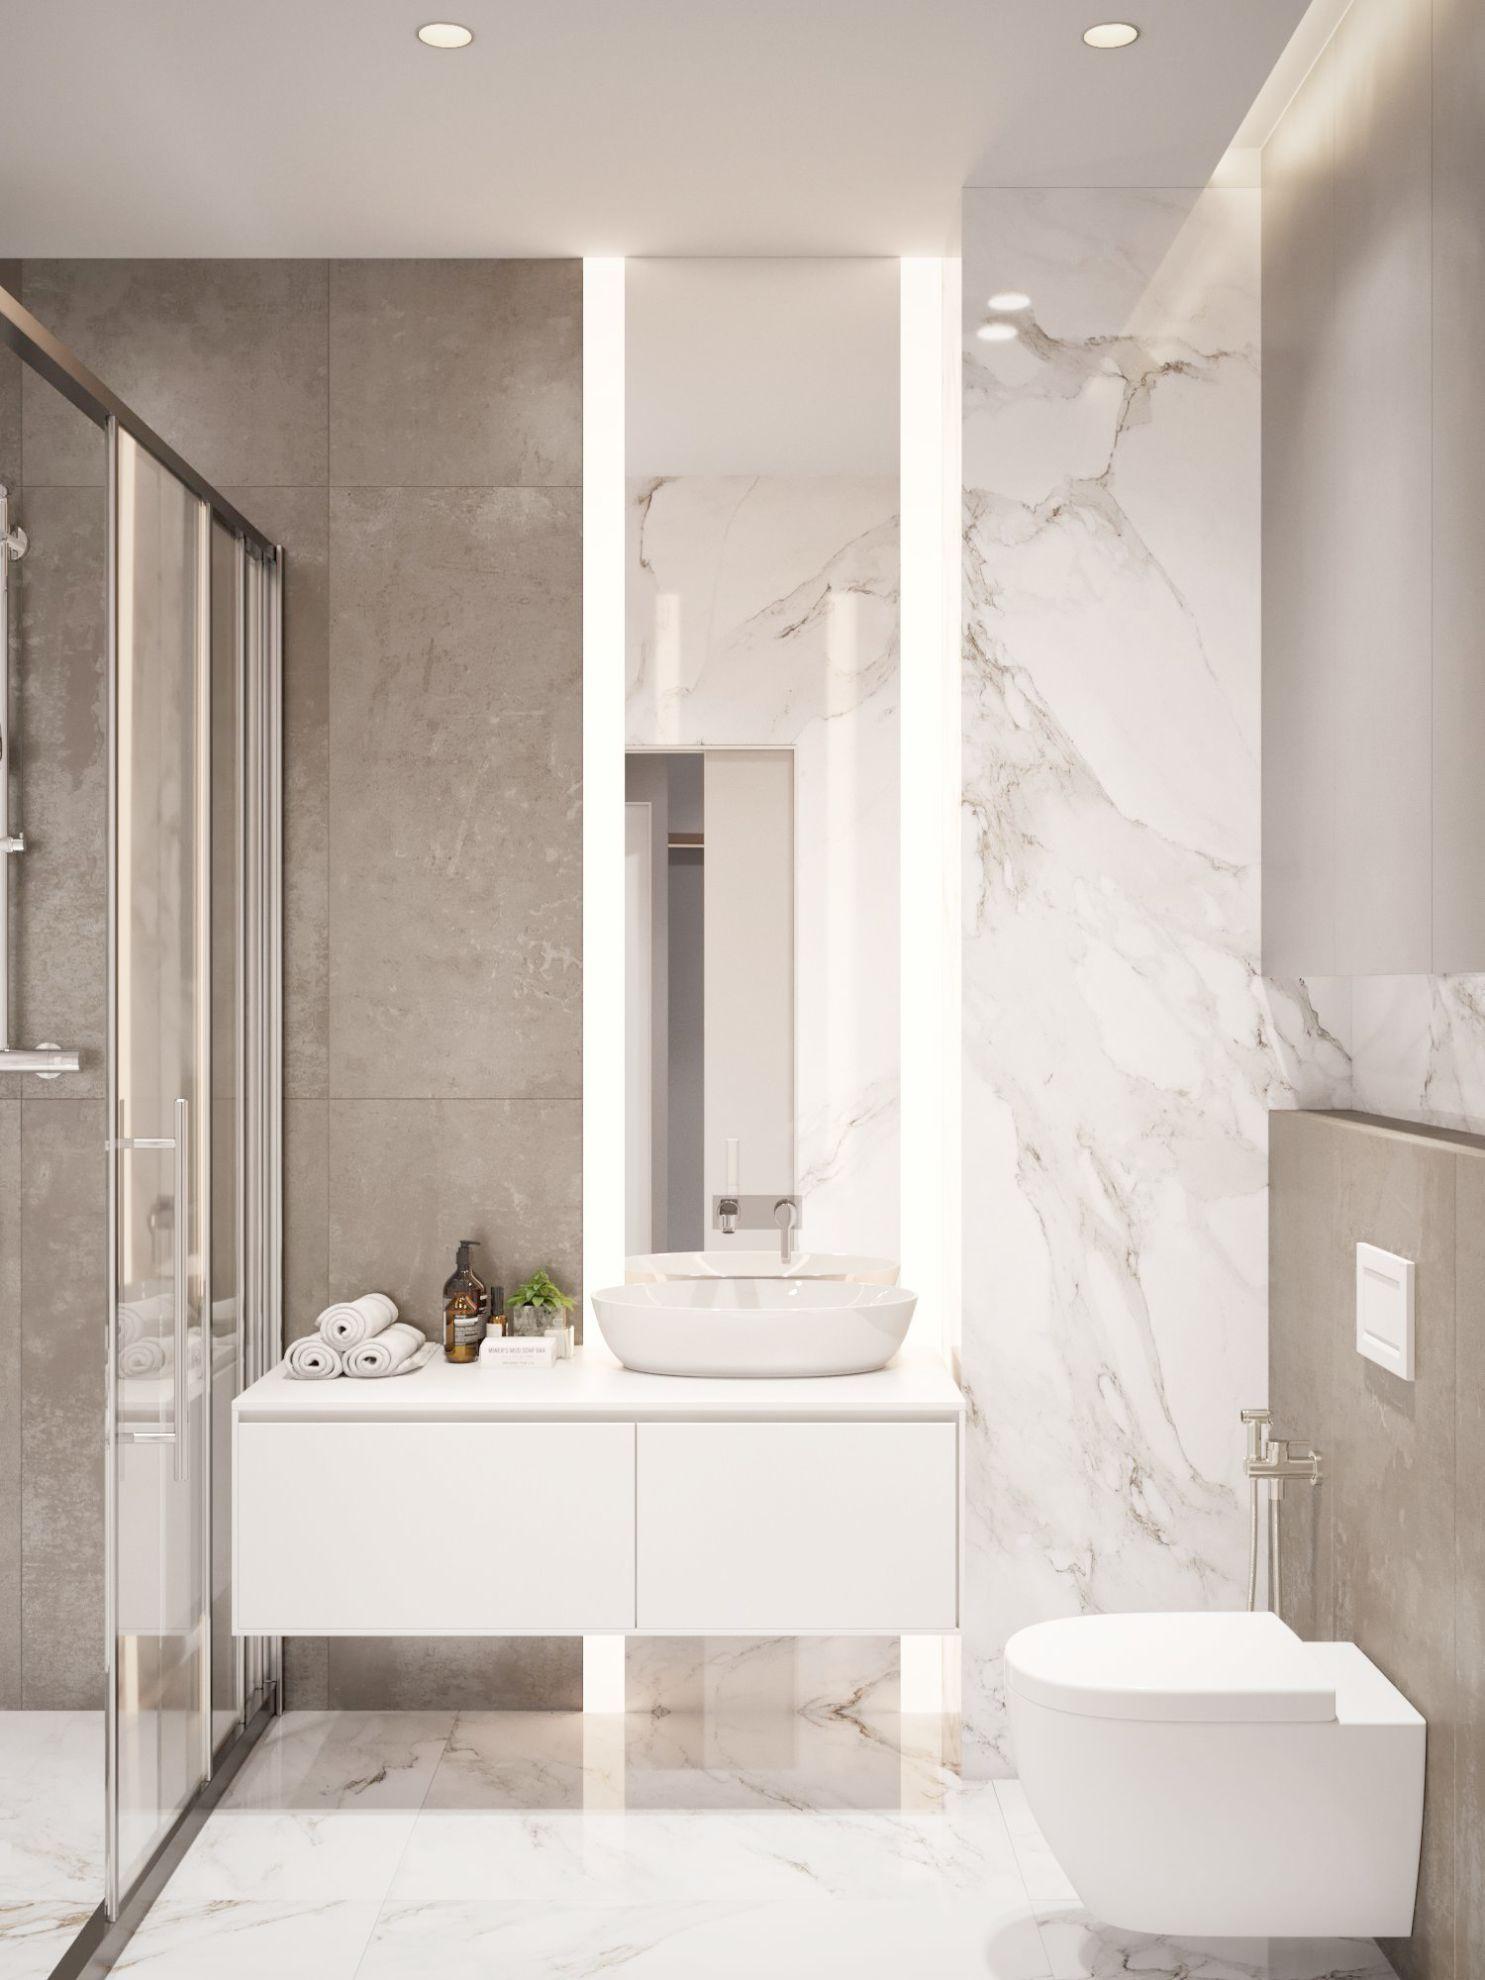 bathroom ideas all white their bathroom remodel reviews it on bathroom renovation ideas white id=42217